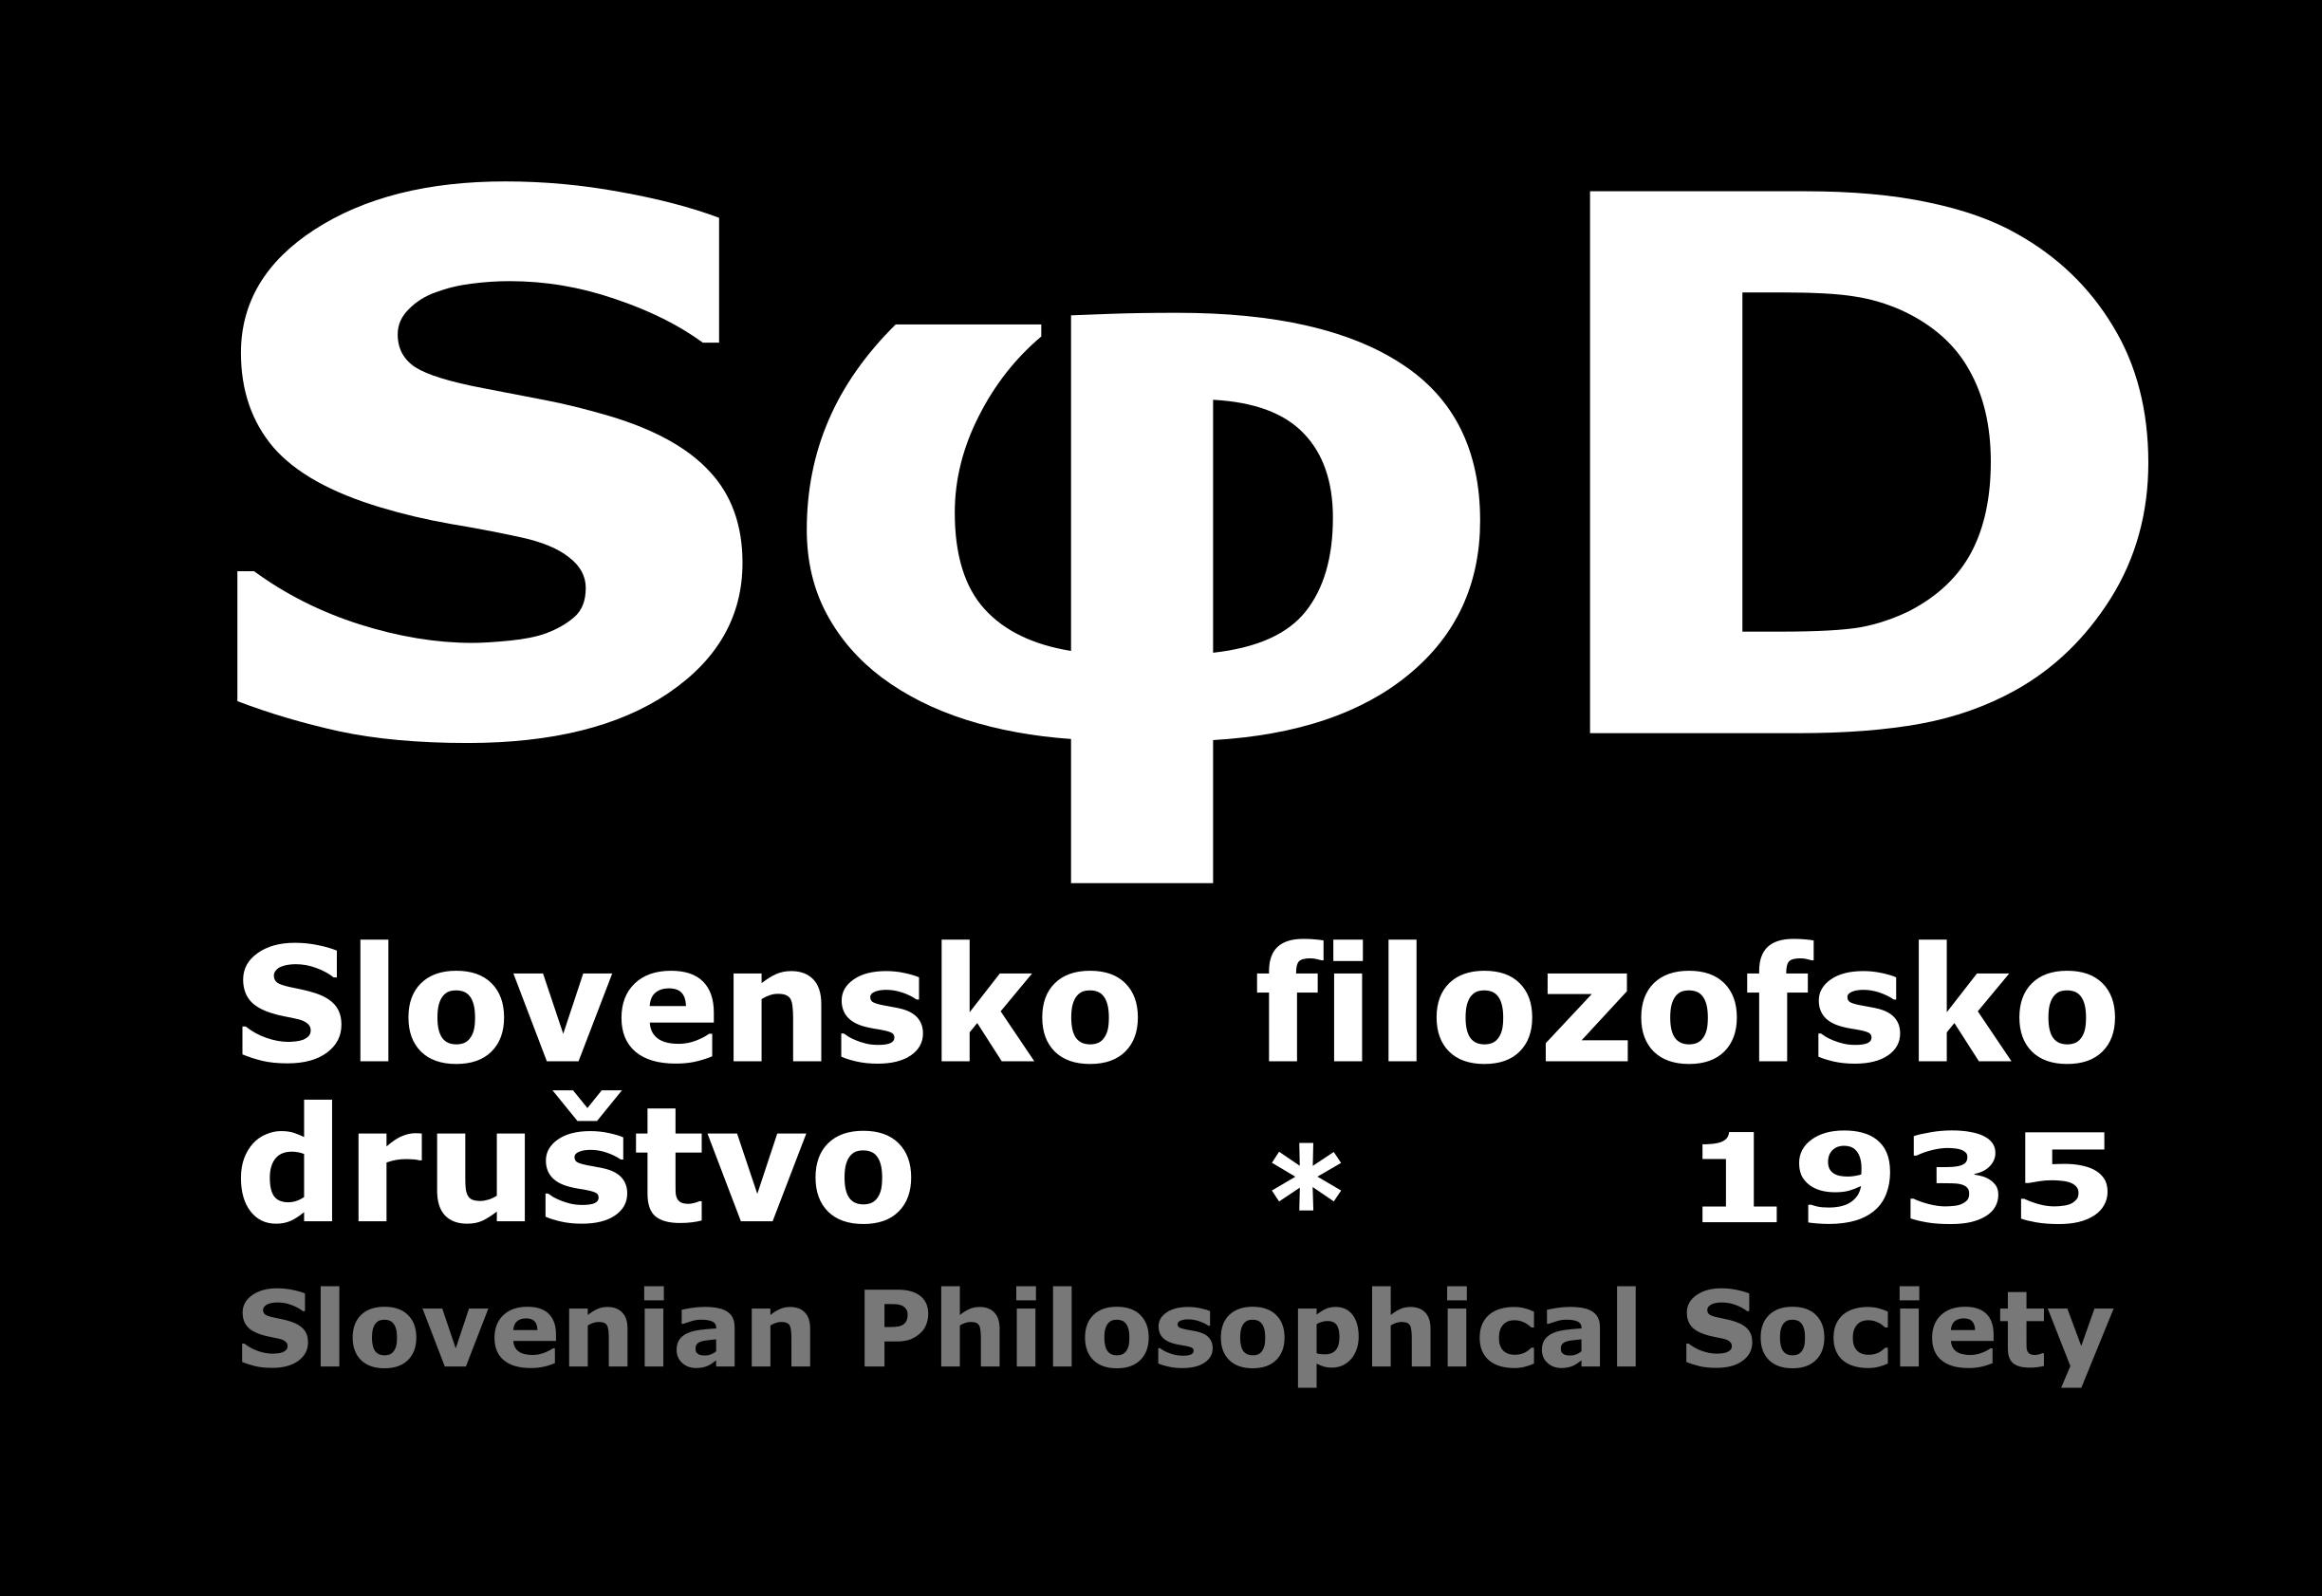 sfd_logo_crno-ozadje